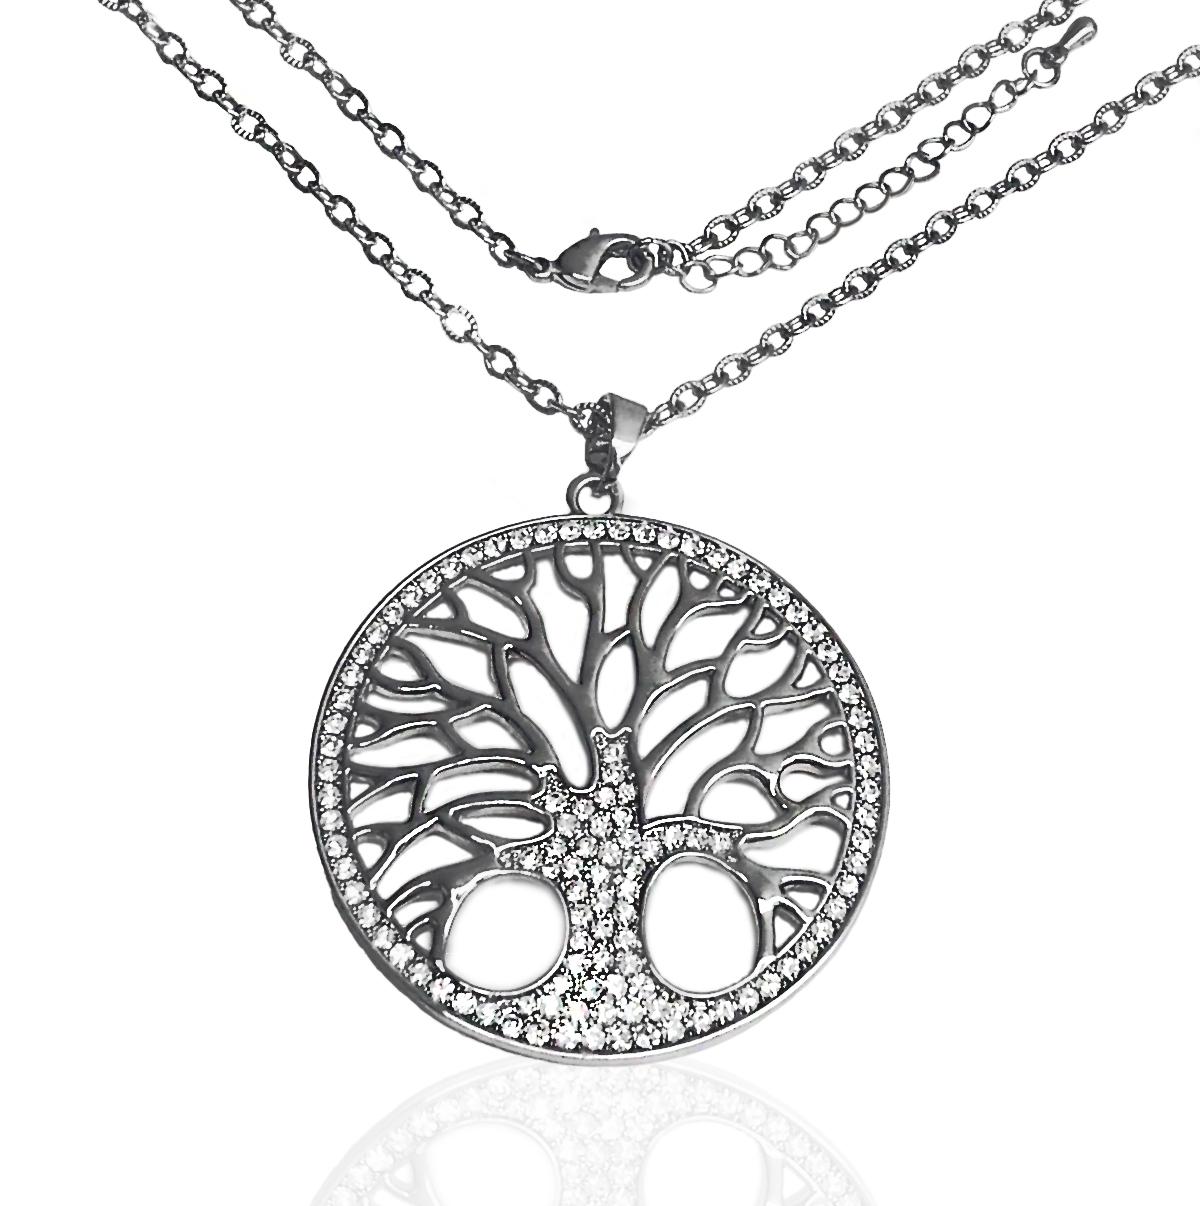 Halskette XXL-Kette 85cm Anhänger Lebensbaum Silber Gold Antiksilber Strass Schmuck K1623-P